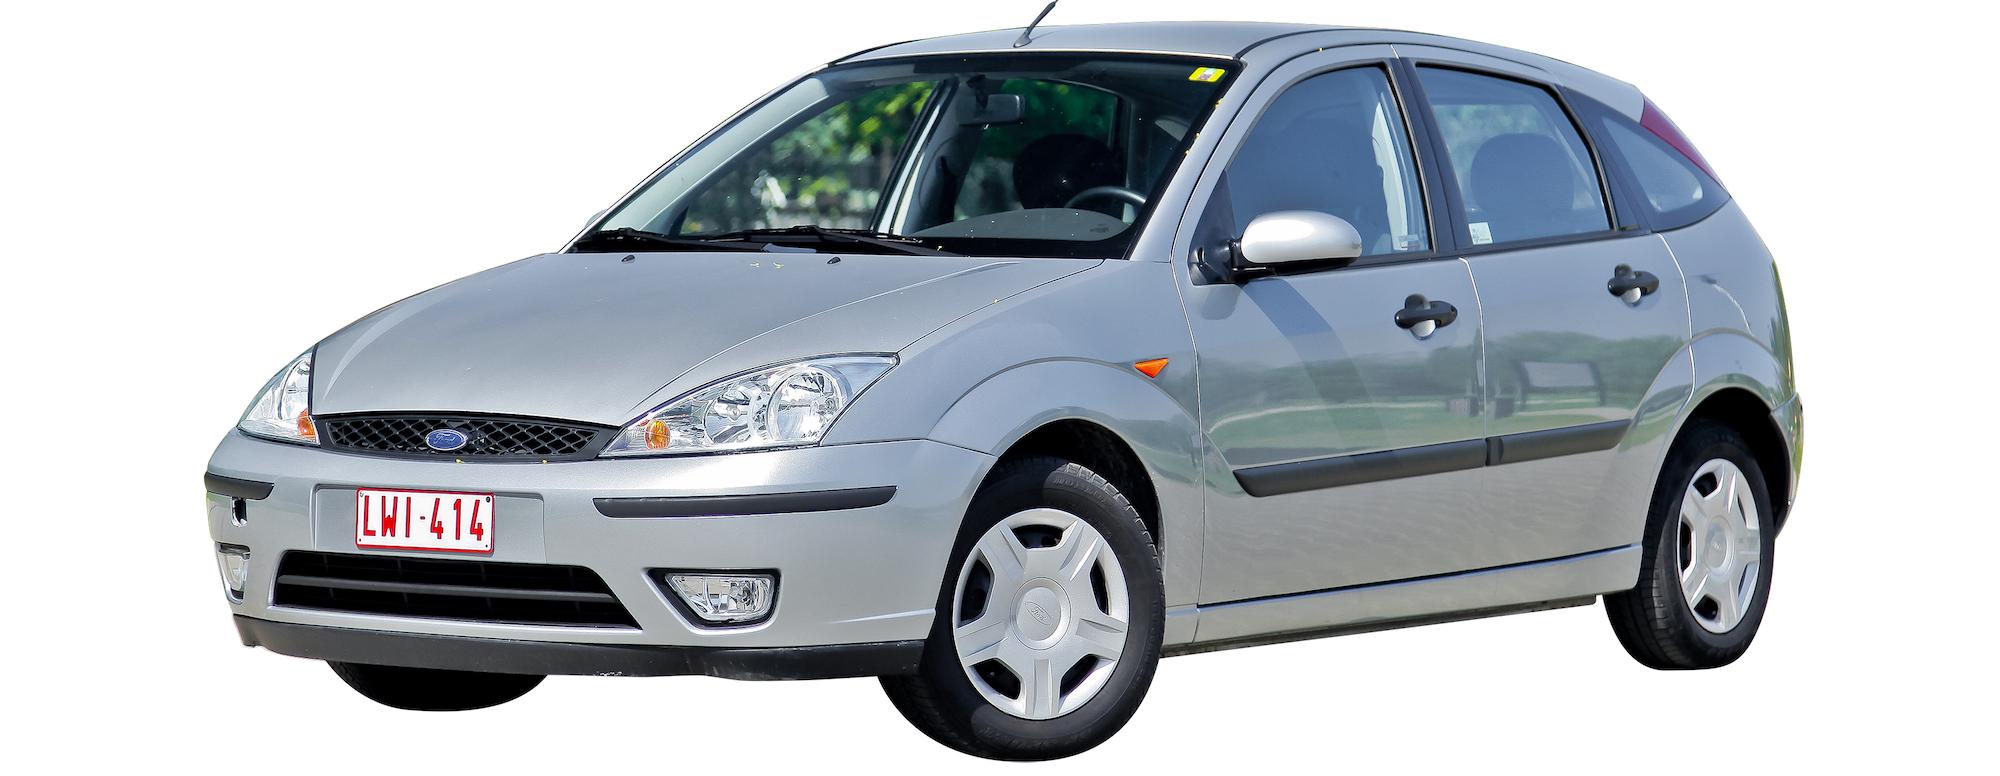 Ford Focus I(1998-2004)